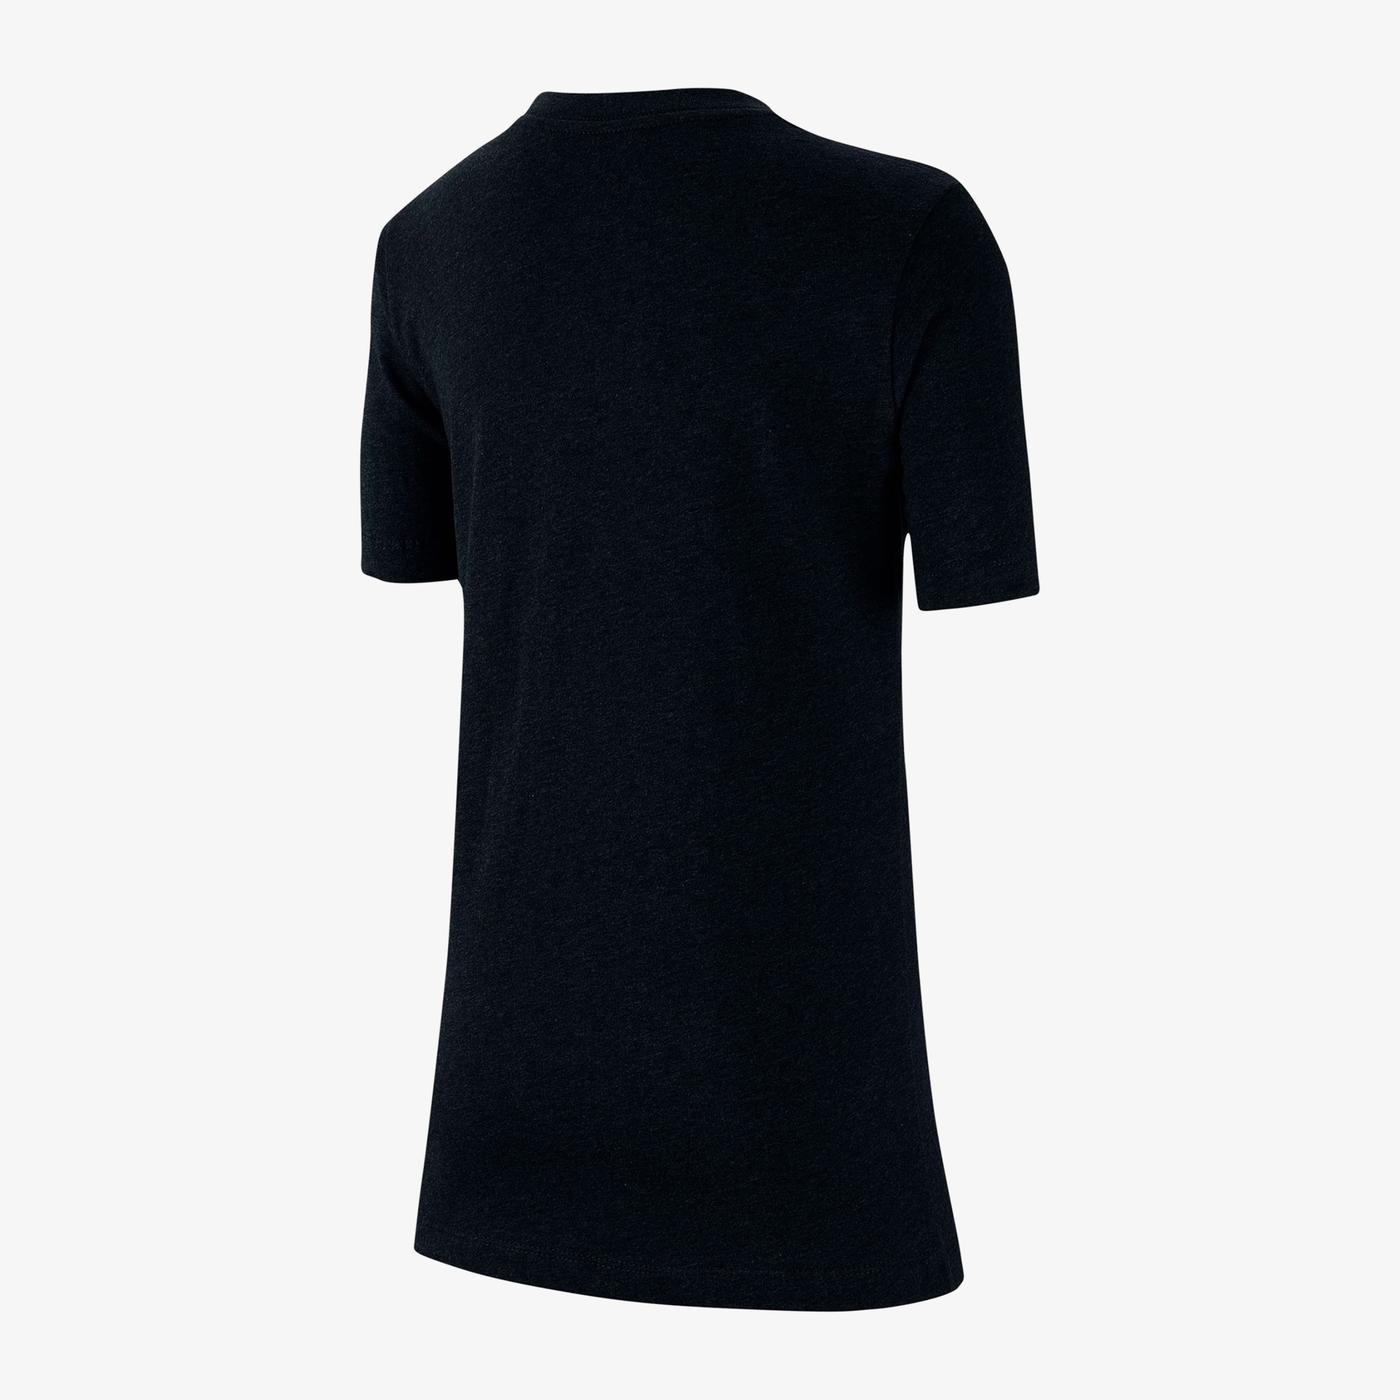 Nike Sportswear Çocuk Siyah T-Shirt